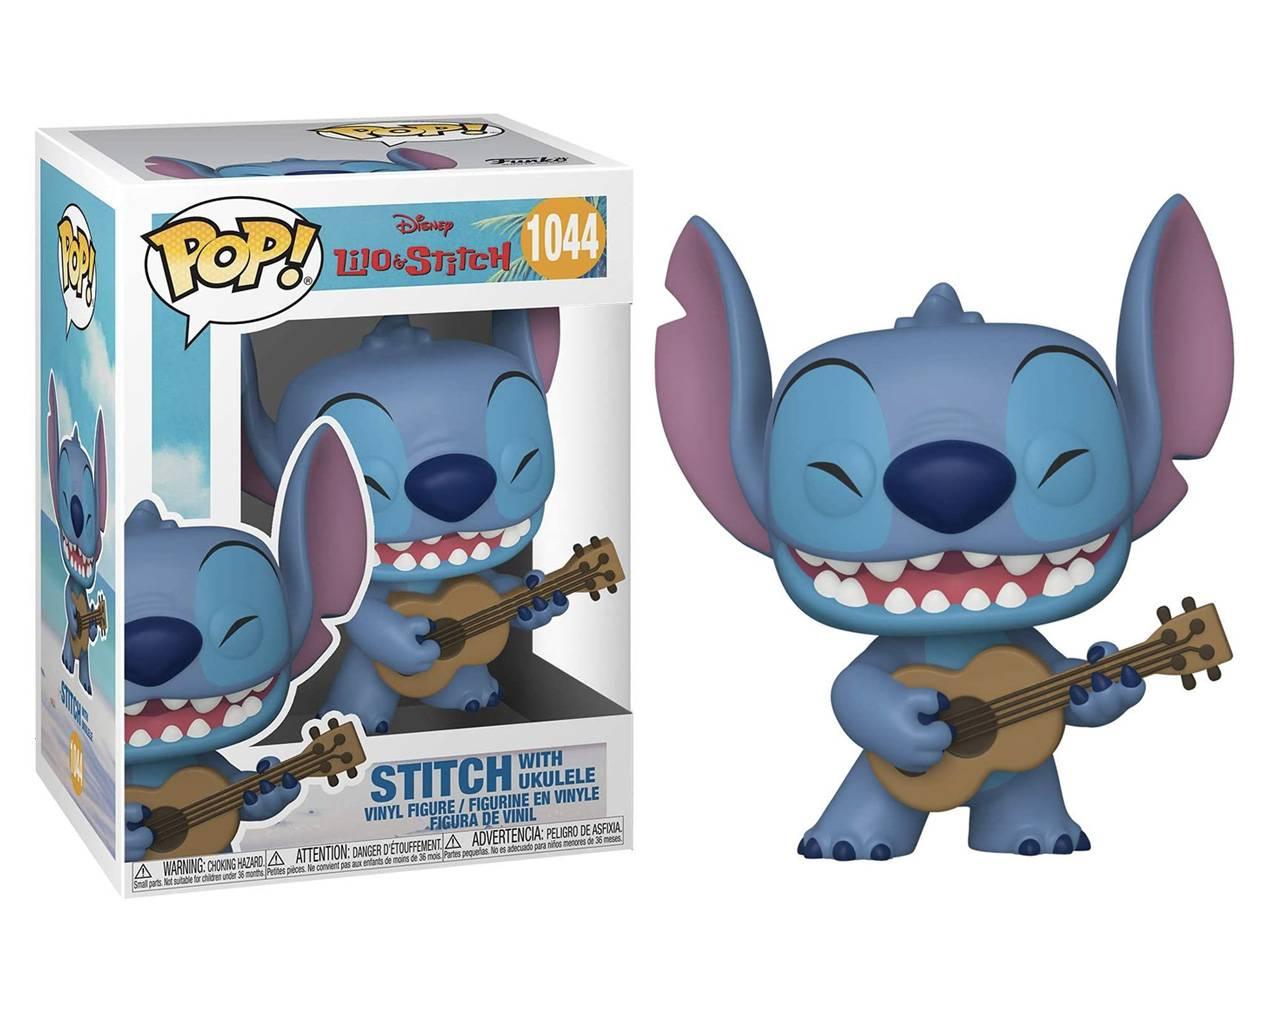 Stitch with Ukulele Pop! Vinyl